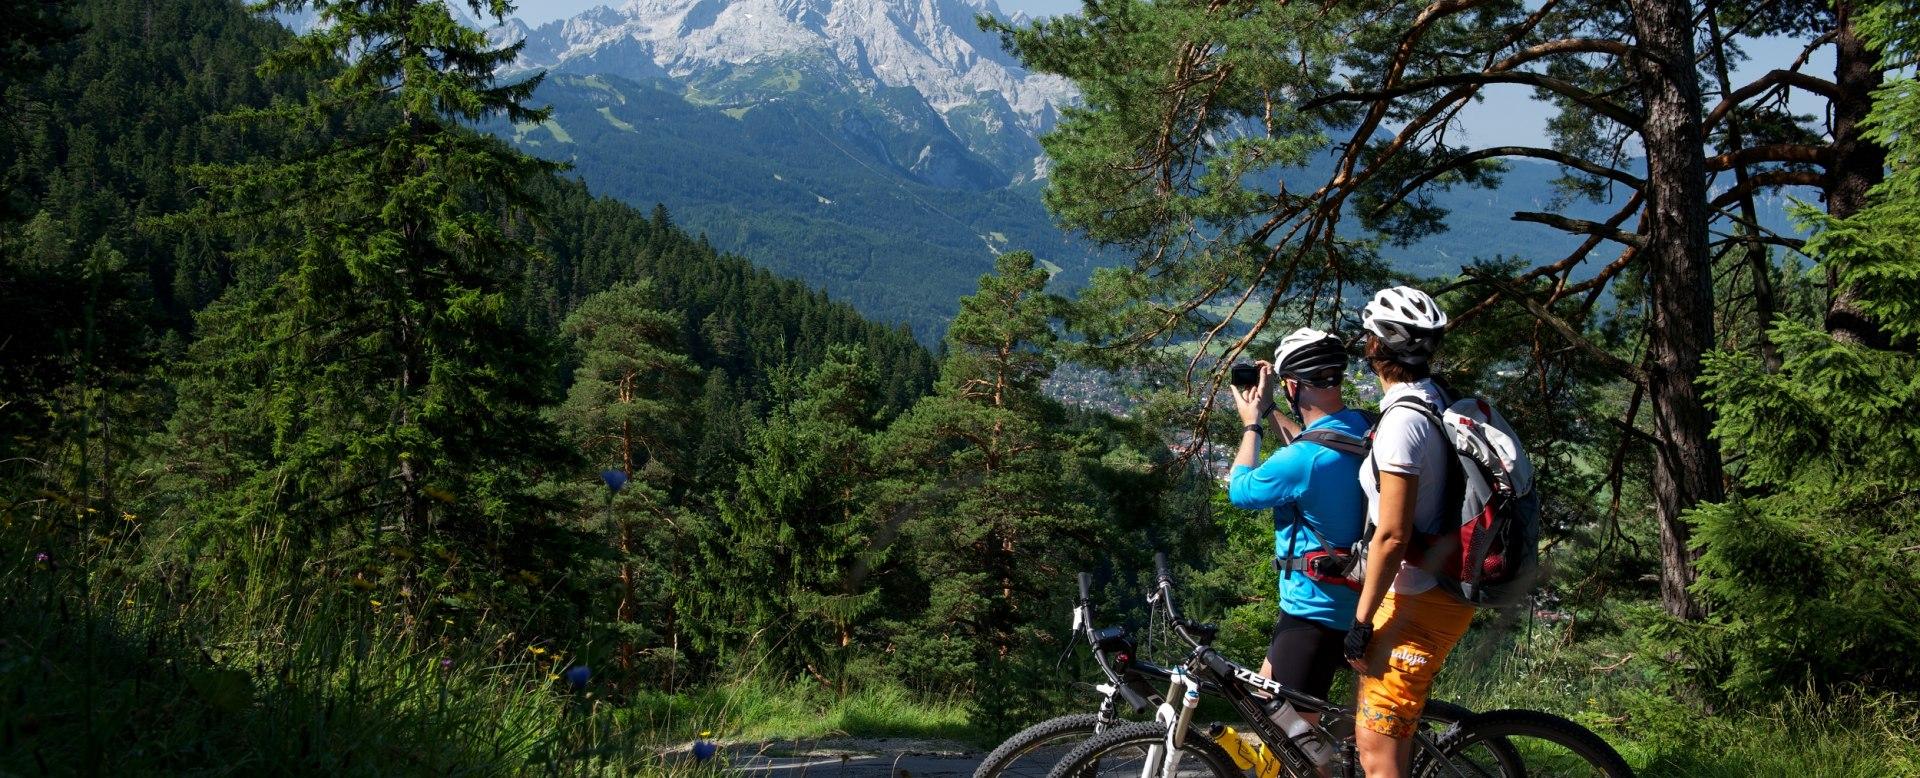 Mountainbiking in Grainau, © Zugspitzland